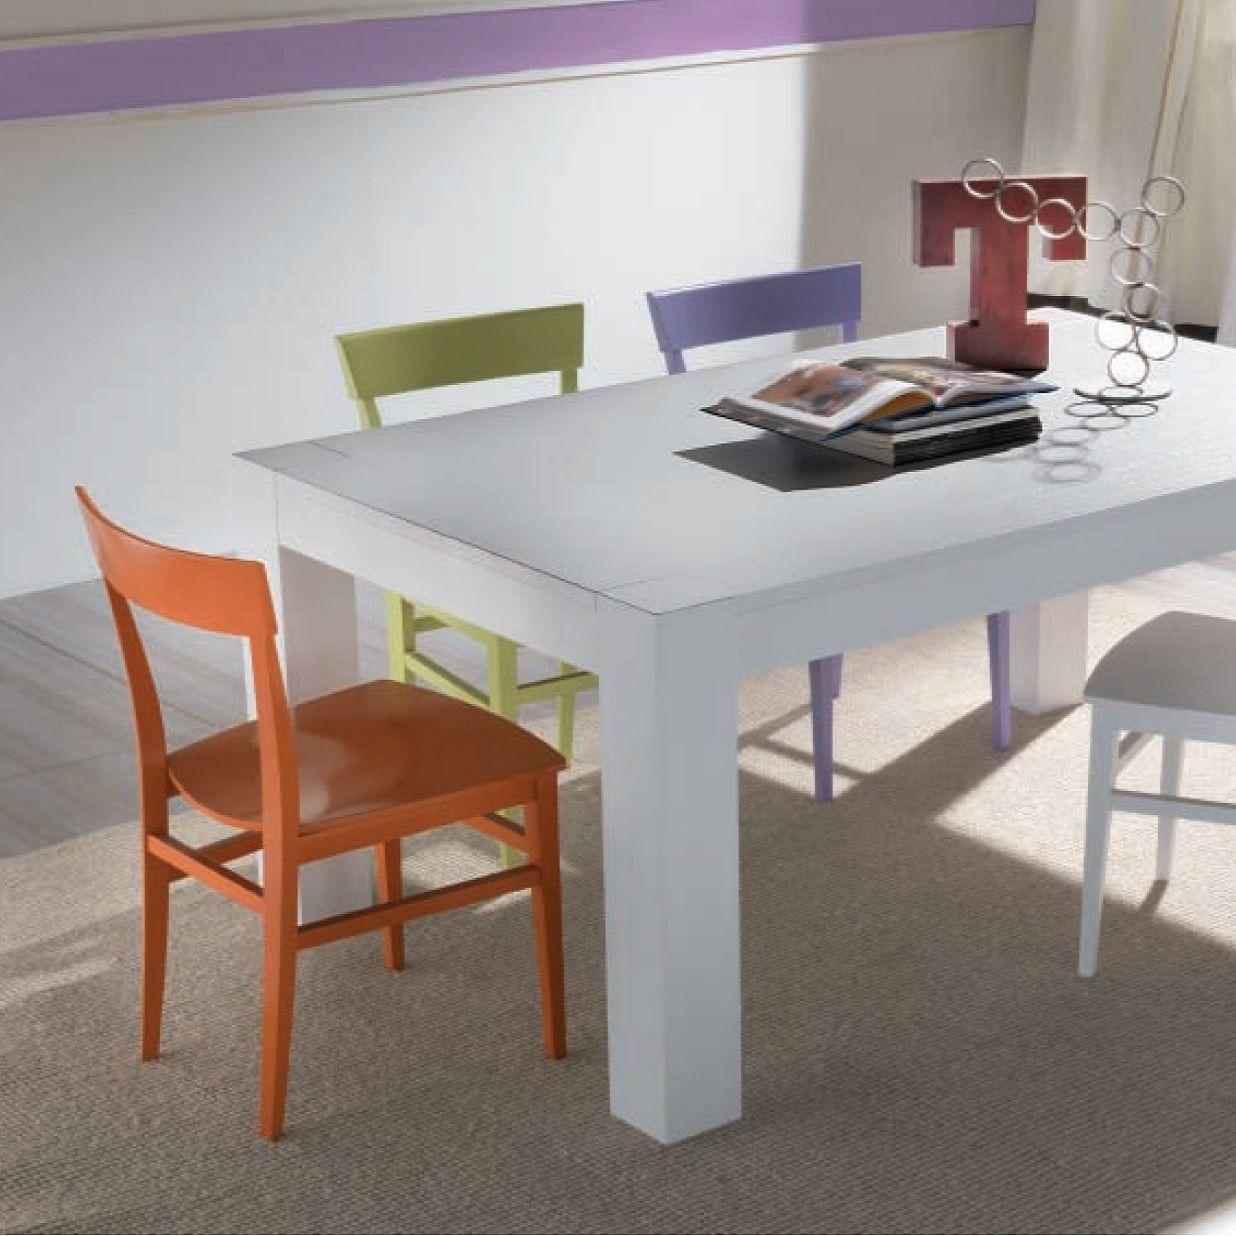 Tavolo contemporaneo tavoli moderni pinterest - Tavolo contemporaneo ...